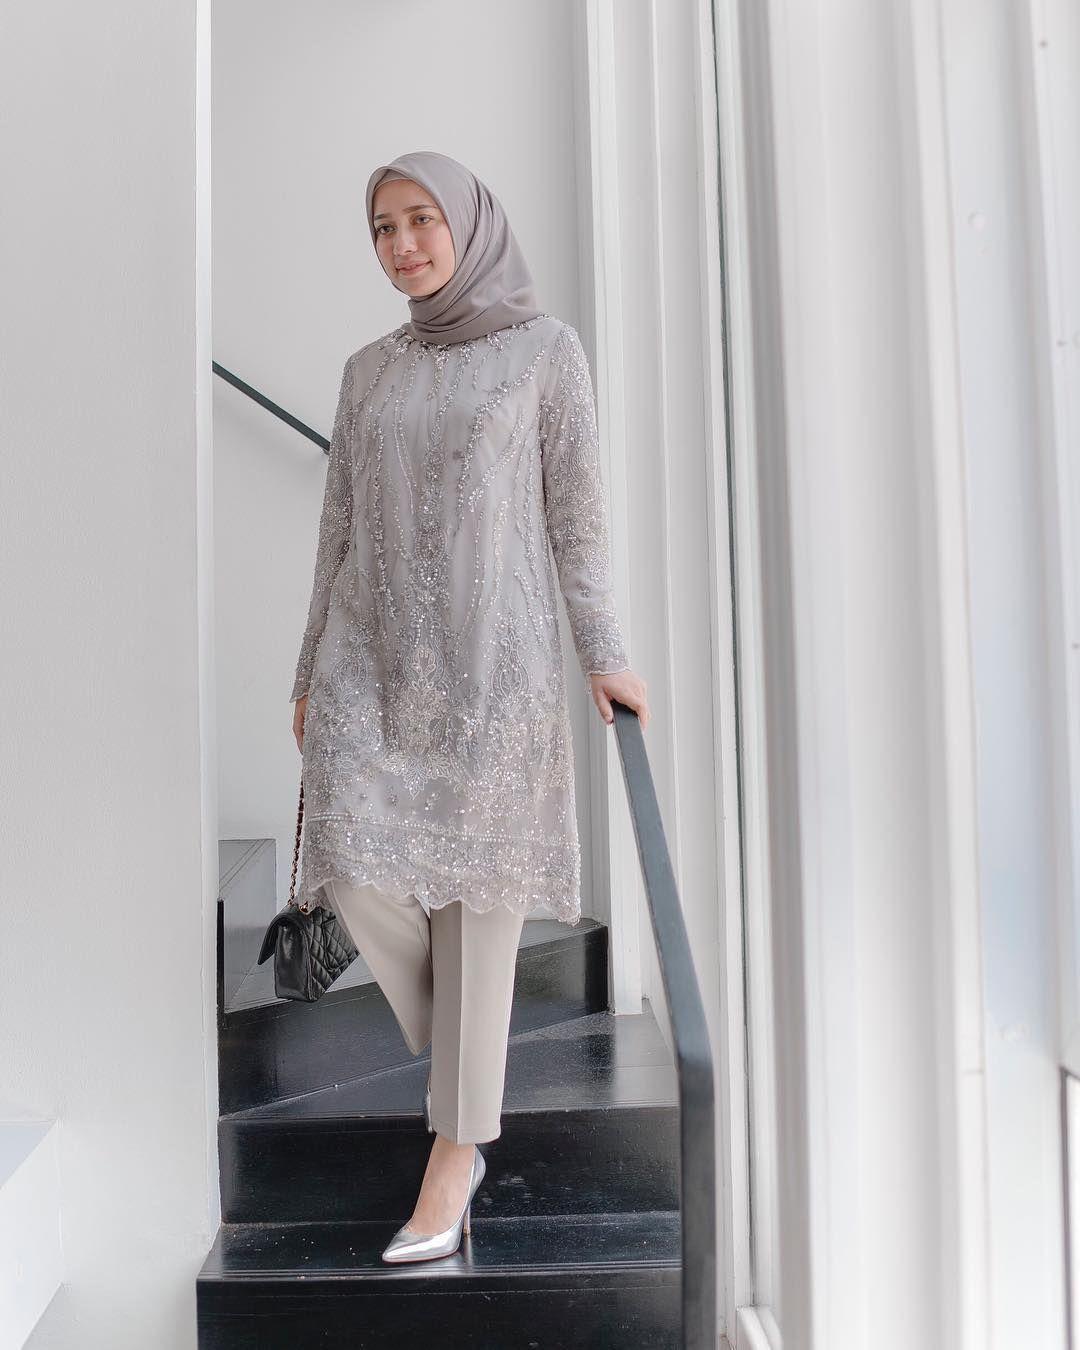 10+ Best Hijab images in 10  hijab fashion, muslim fashion